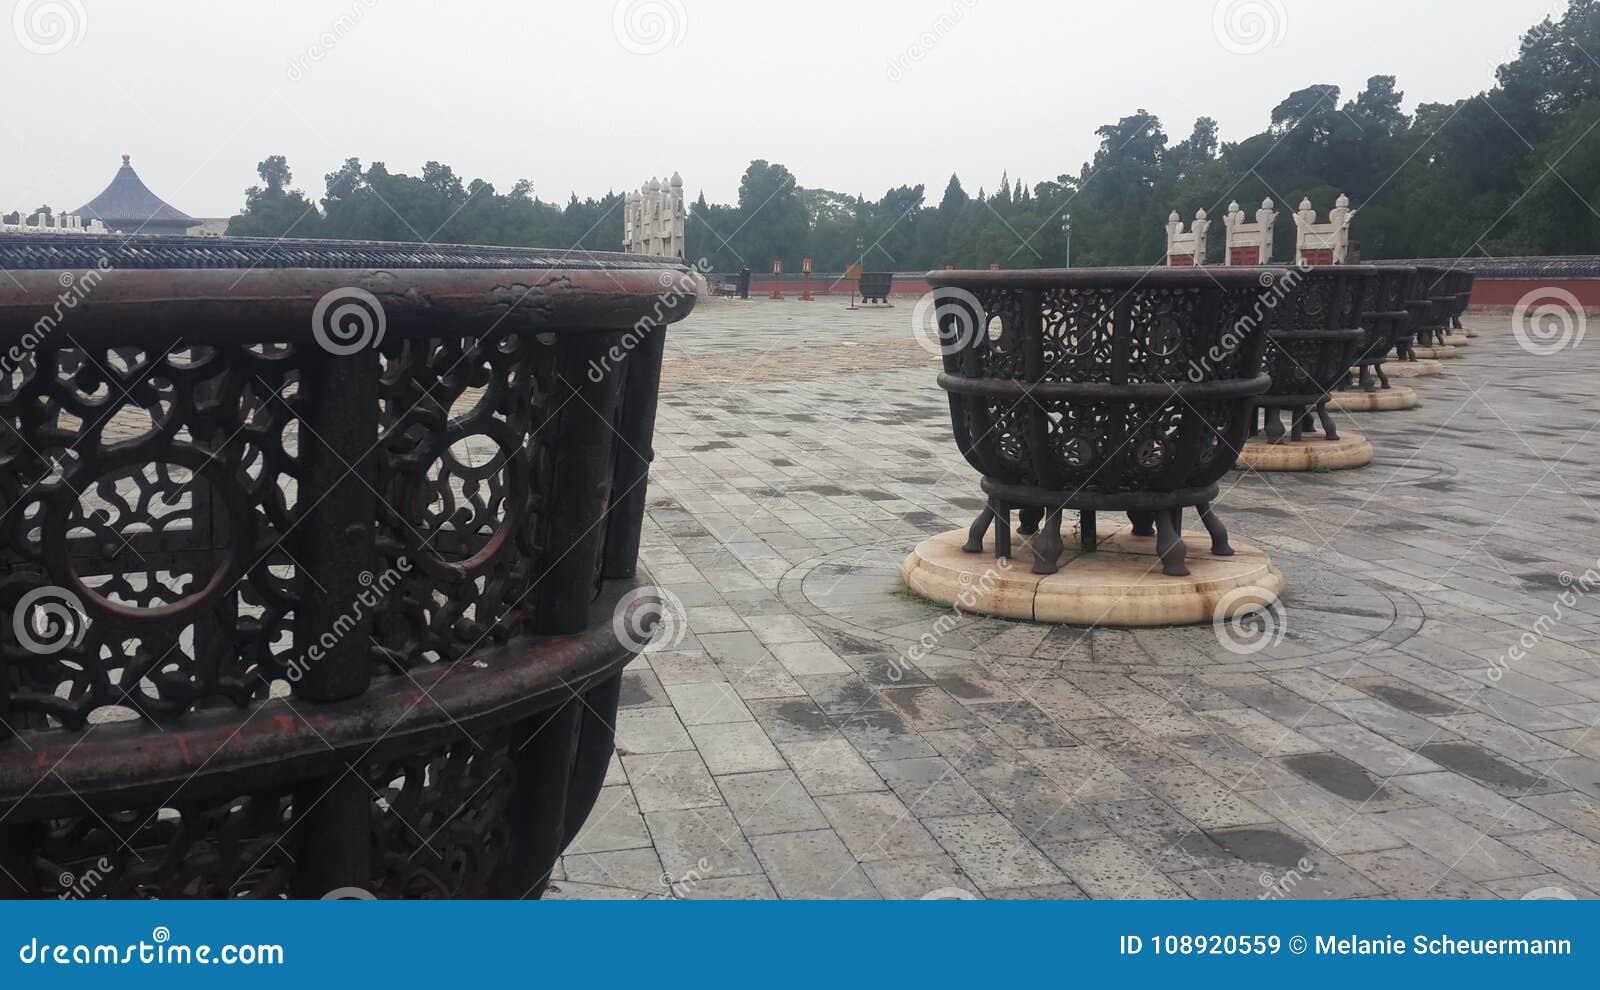 Metal Altars in Temple of Heaven in Beijing, China